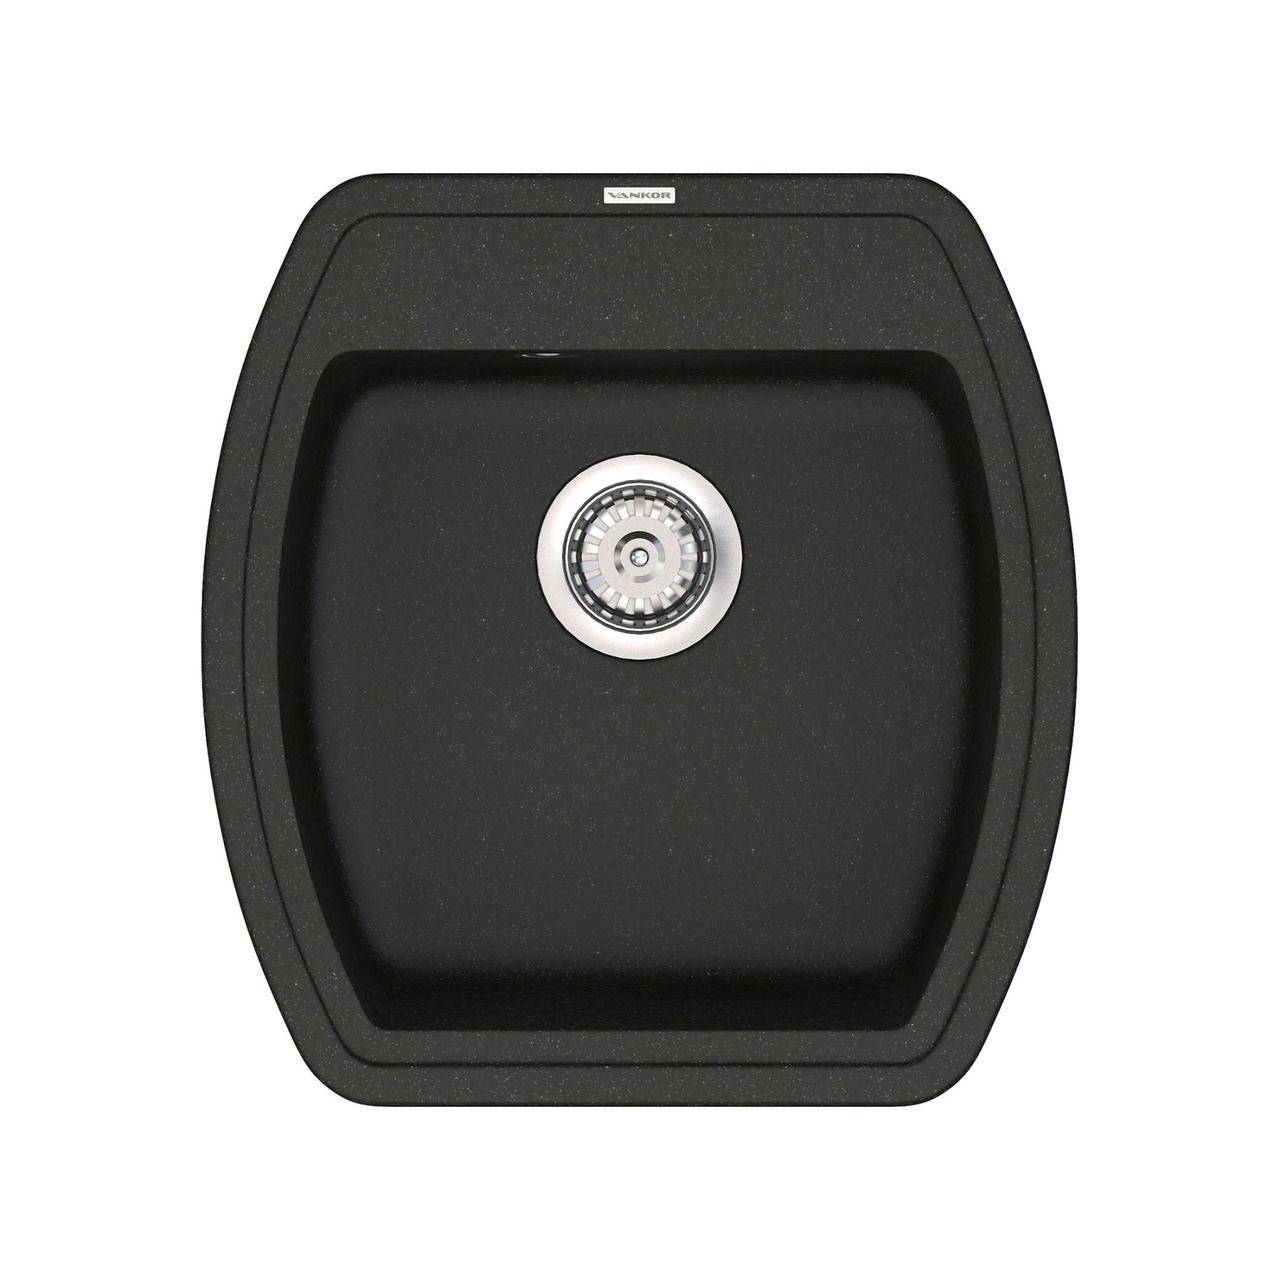 Кухонная мойка кварц 51*48 см VANKOR Norton NMP 01.48 Black